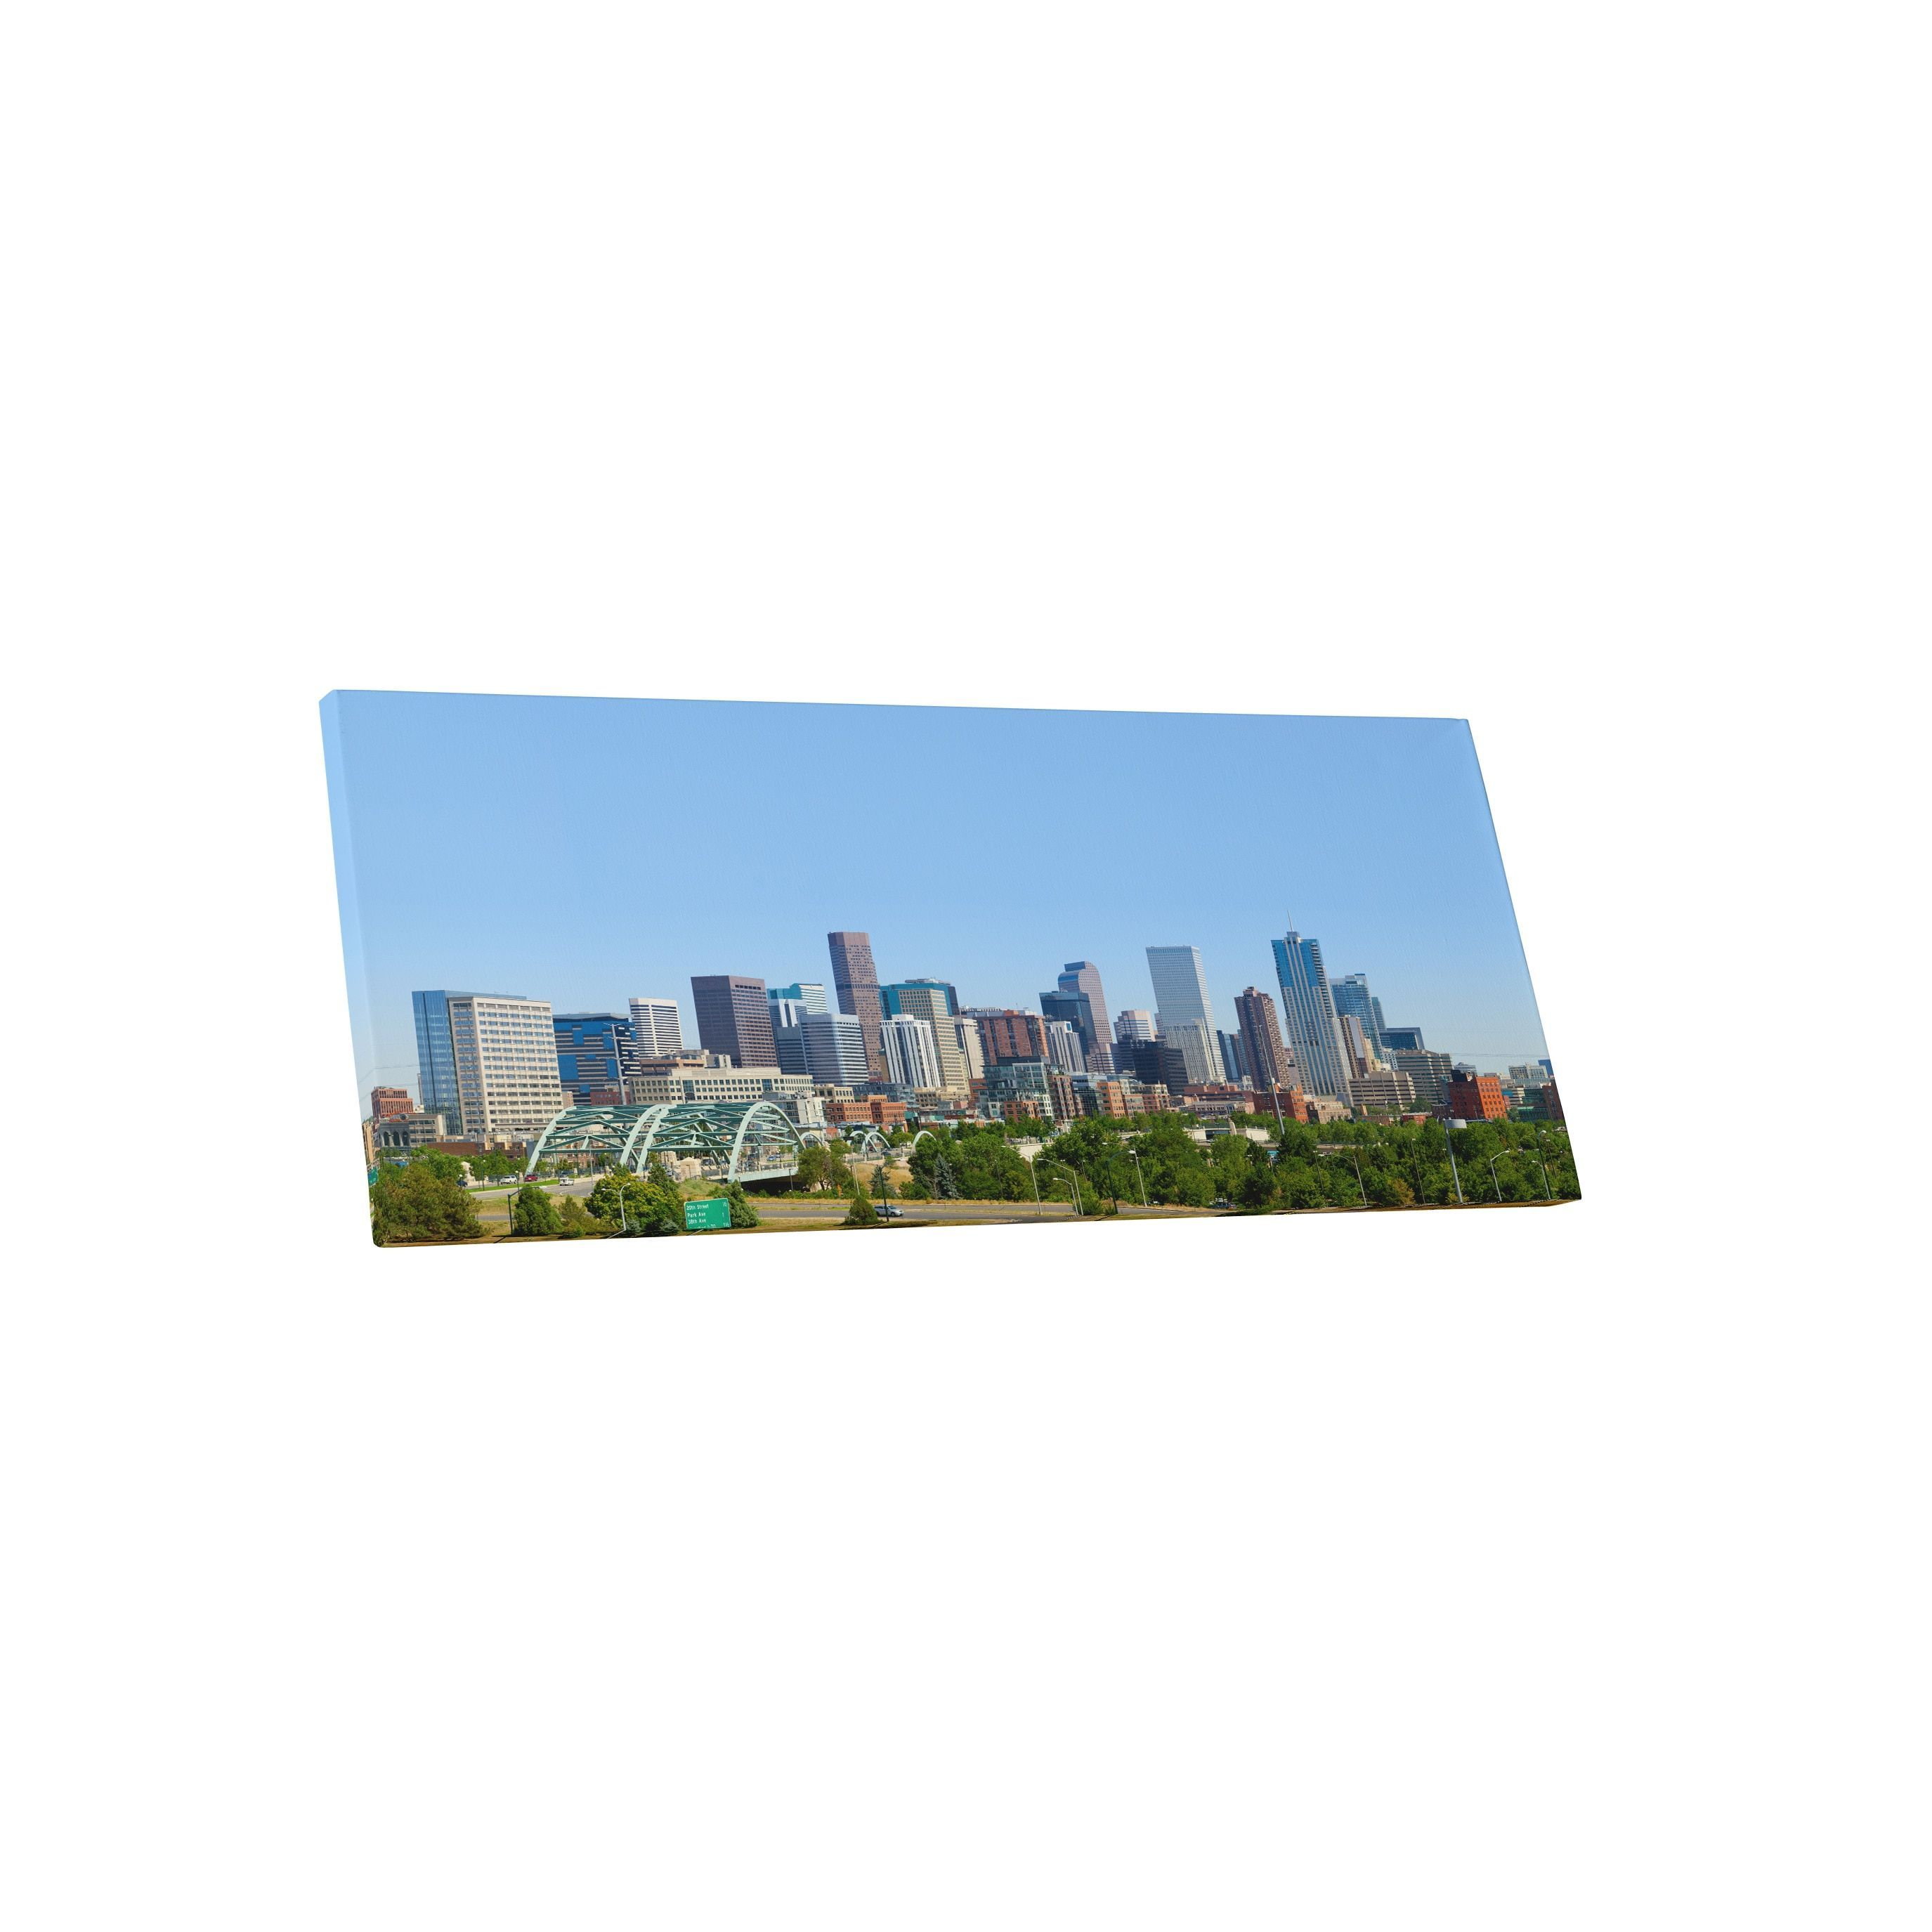 City Skylines 'Denver Colorado' Gallery Wrapped Canvas Wall Art